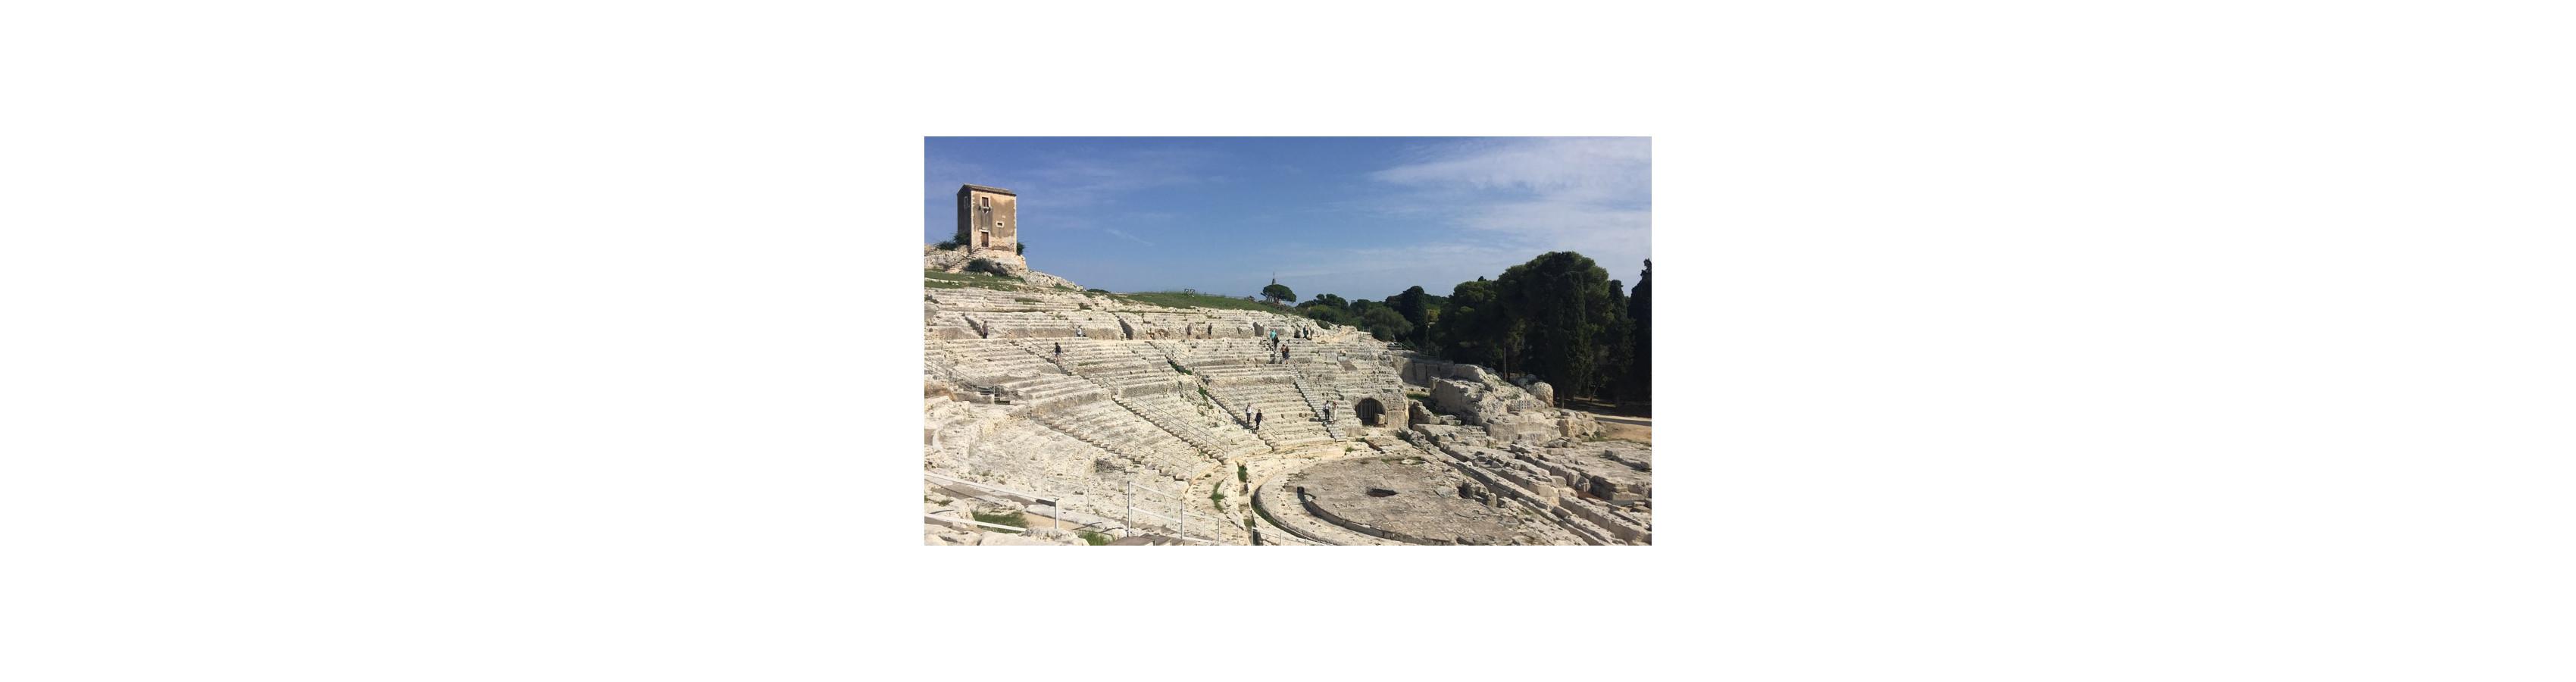 4 jours en Sicile